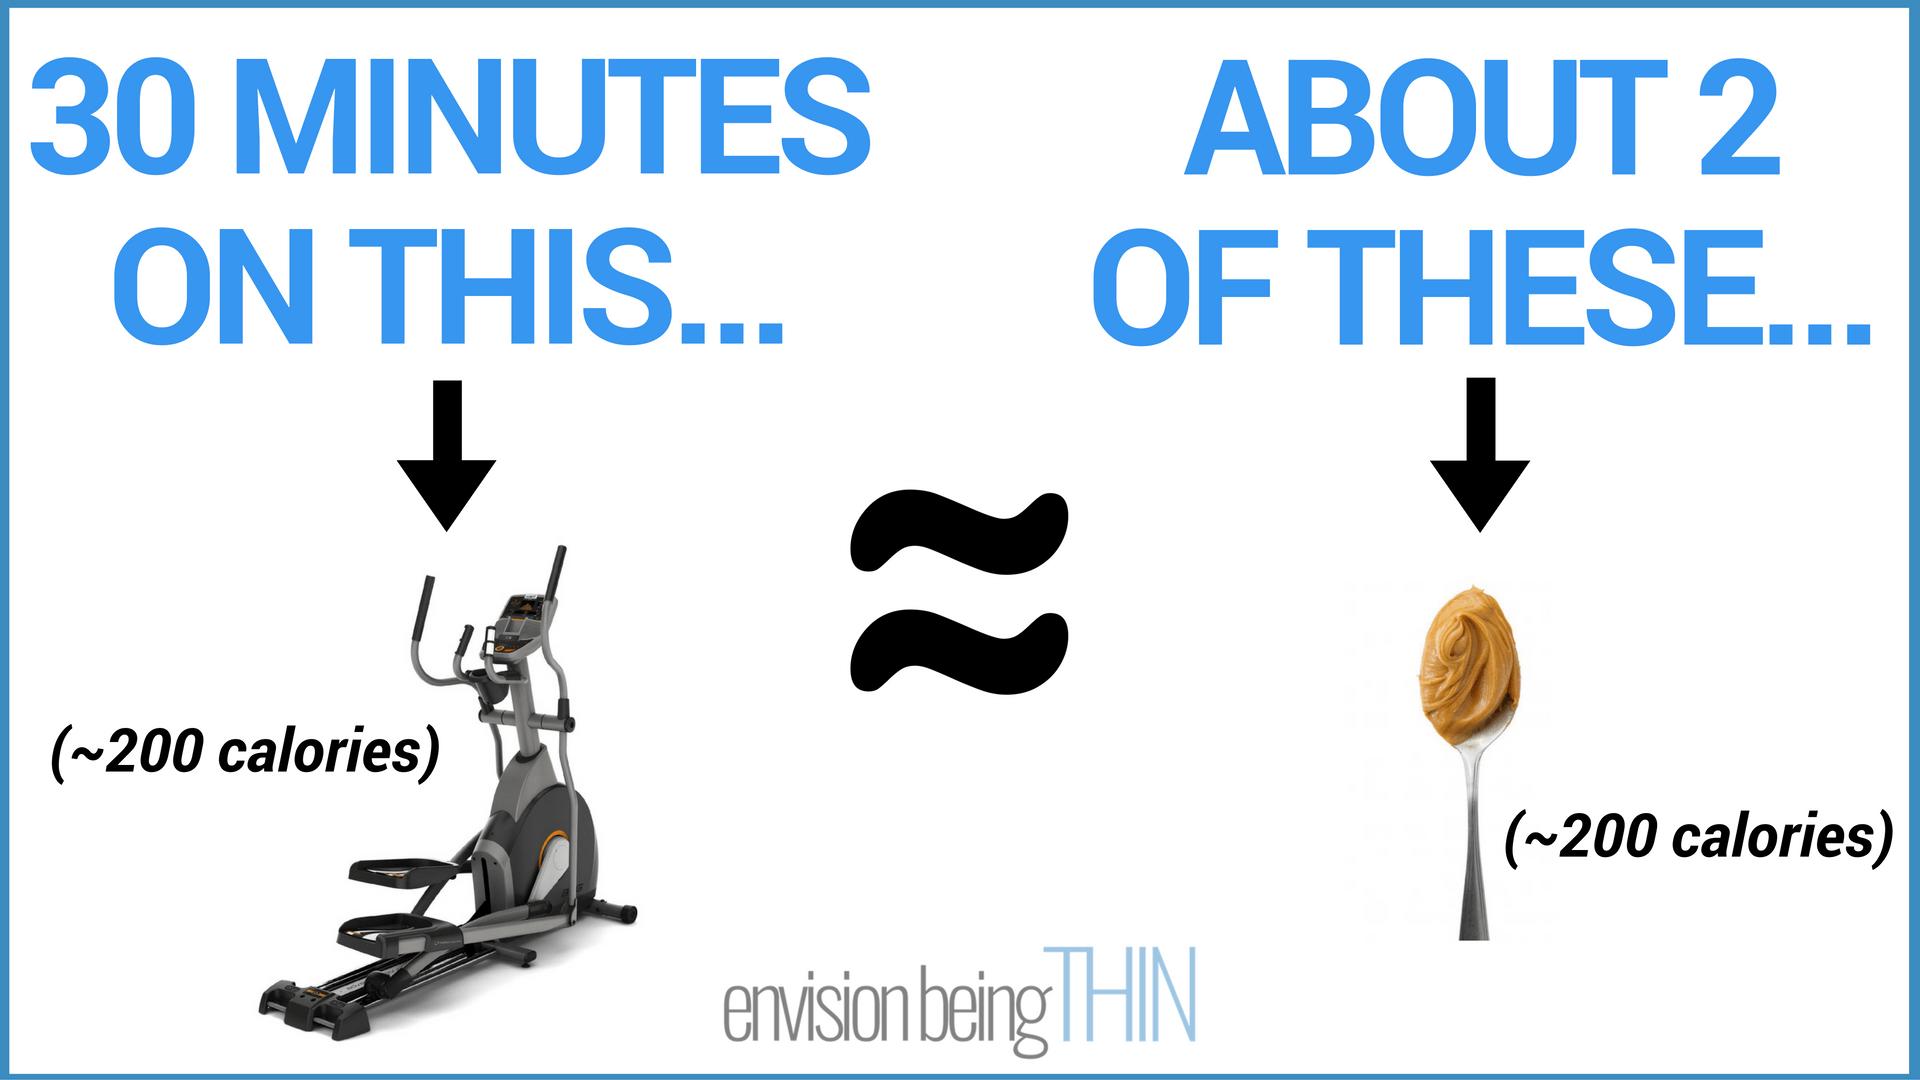 30-mins-cardio-equals-peanut-butter